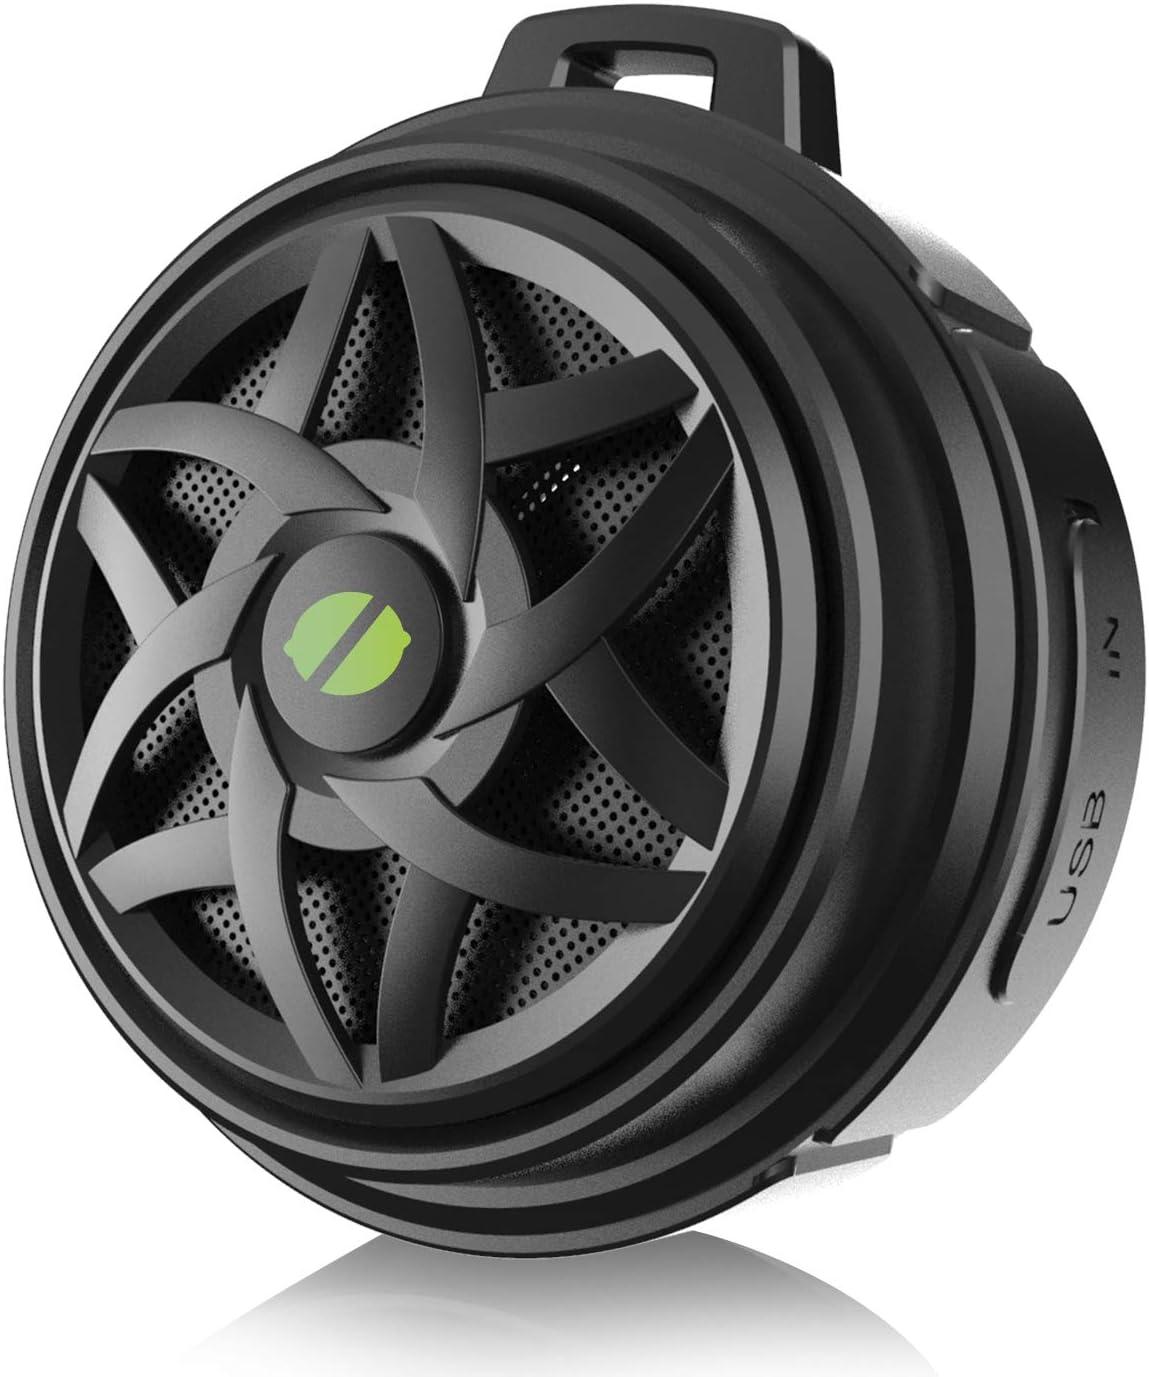 Best Portable: ZeroLemon Bluetooth Speaker